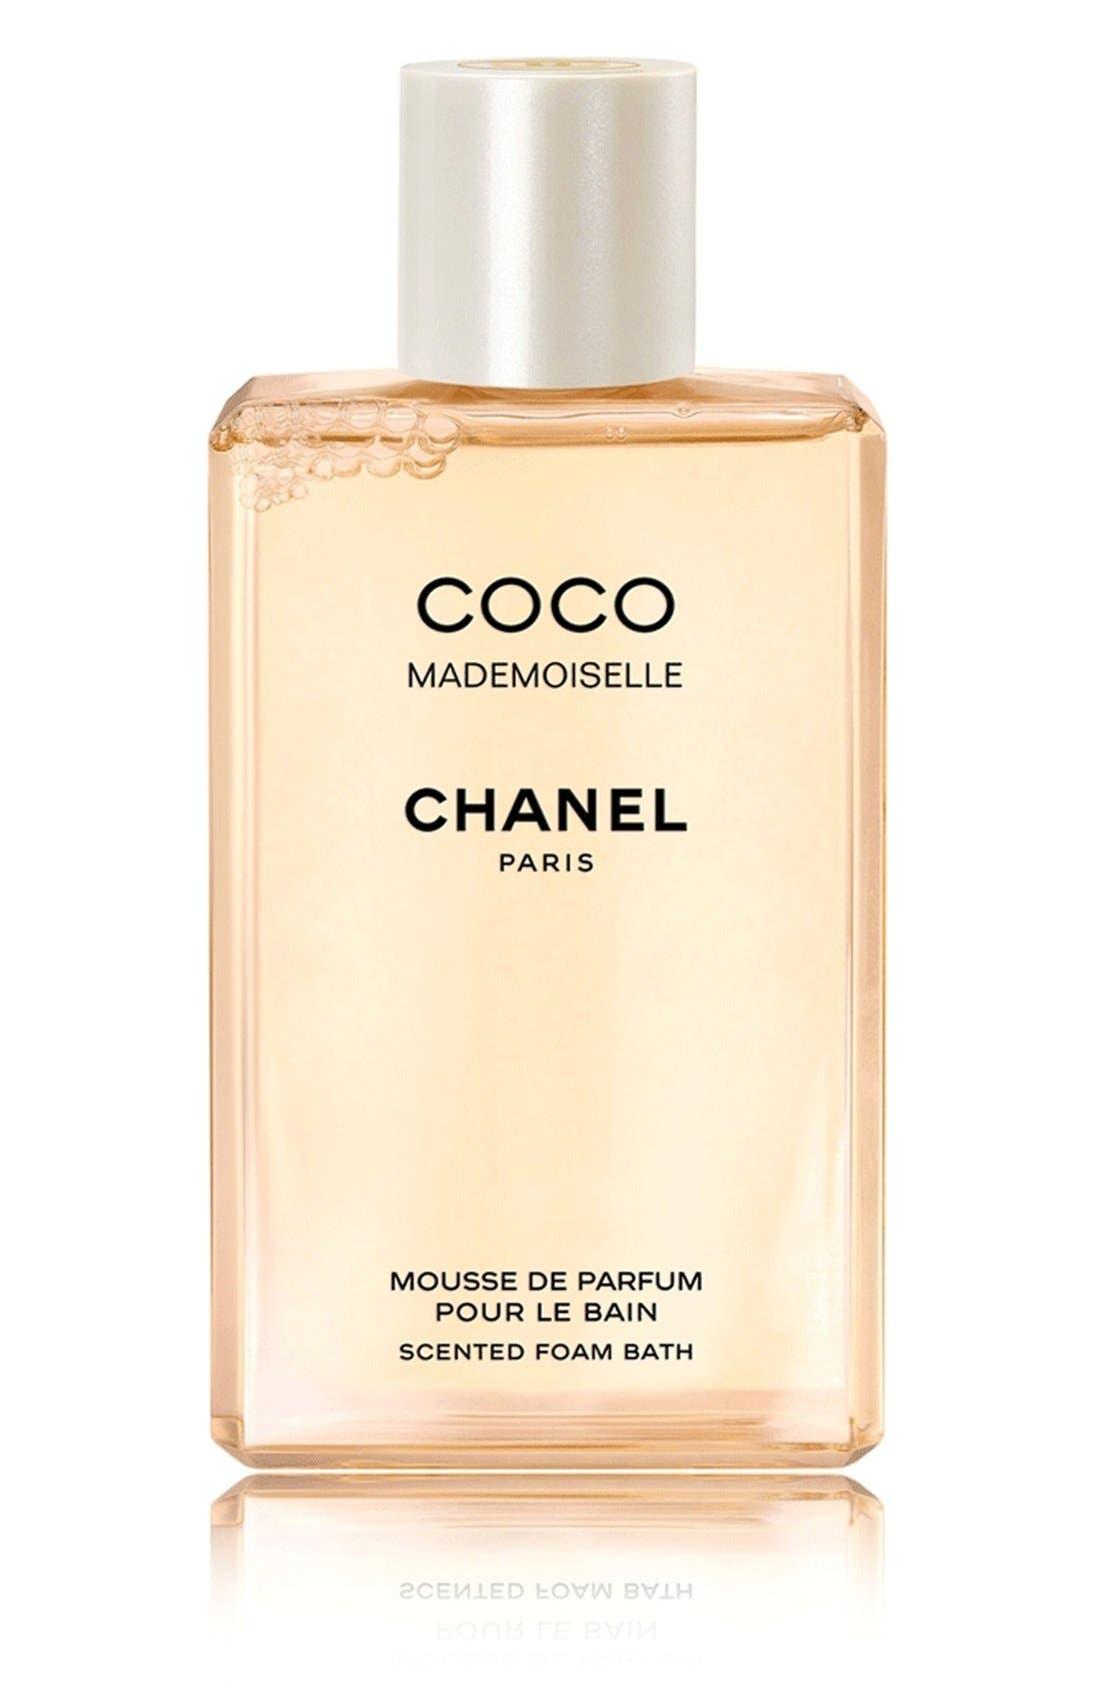 CHANEL COCO MADEMOISELLE  Scented Foam Bath